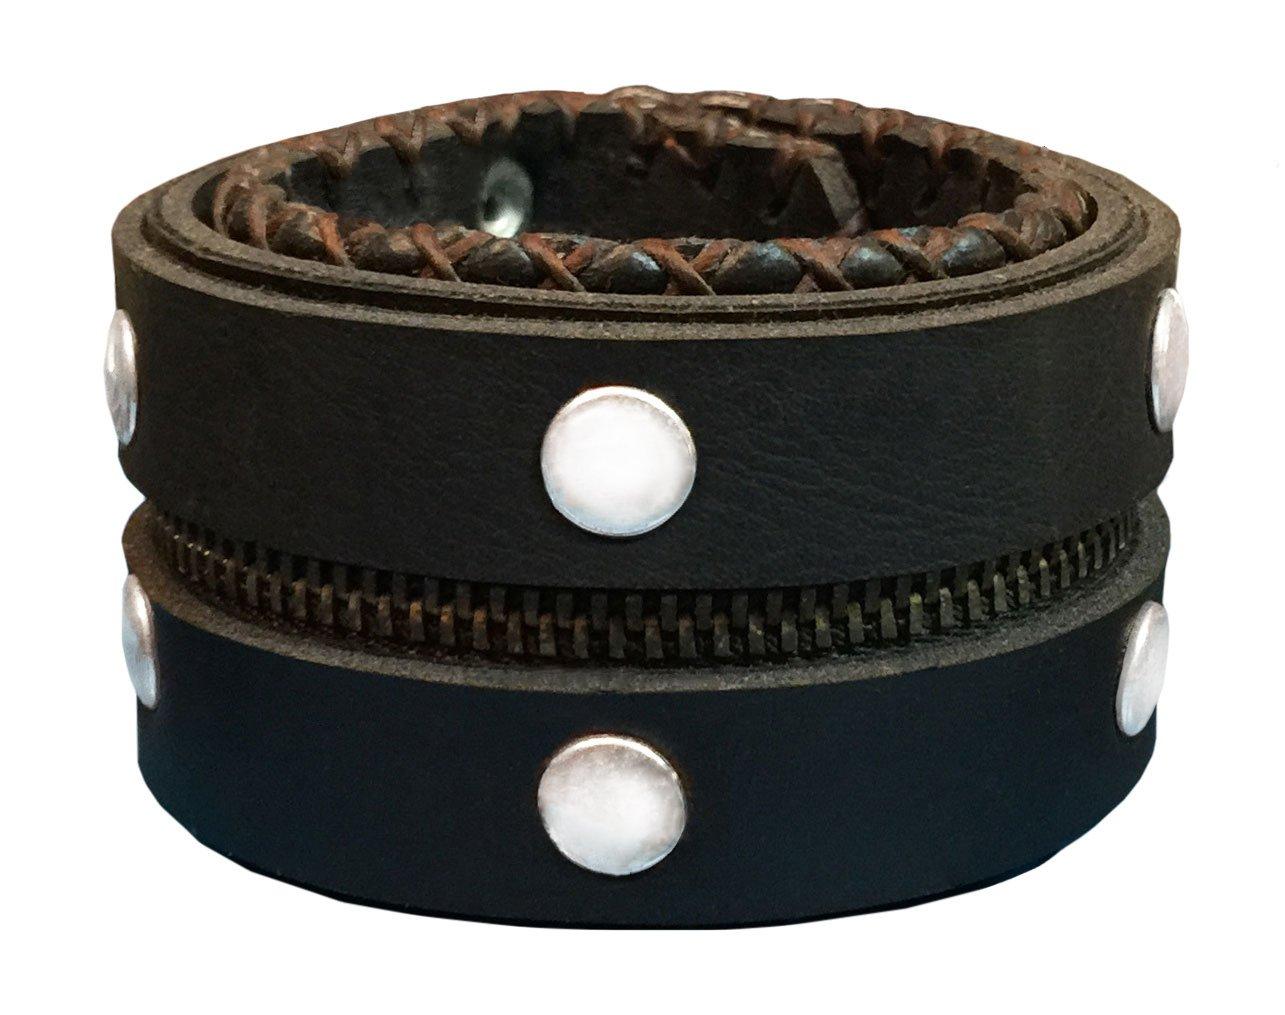 D'SHARK 1.8'' Studded Punk Rock Biker Leather Cuff Bracelet Wristband for Unisex - (Dark Brown)